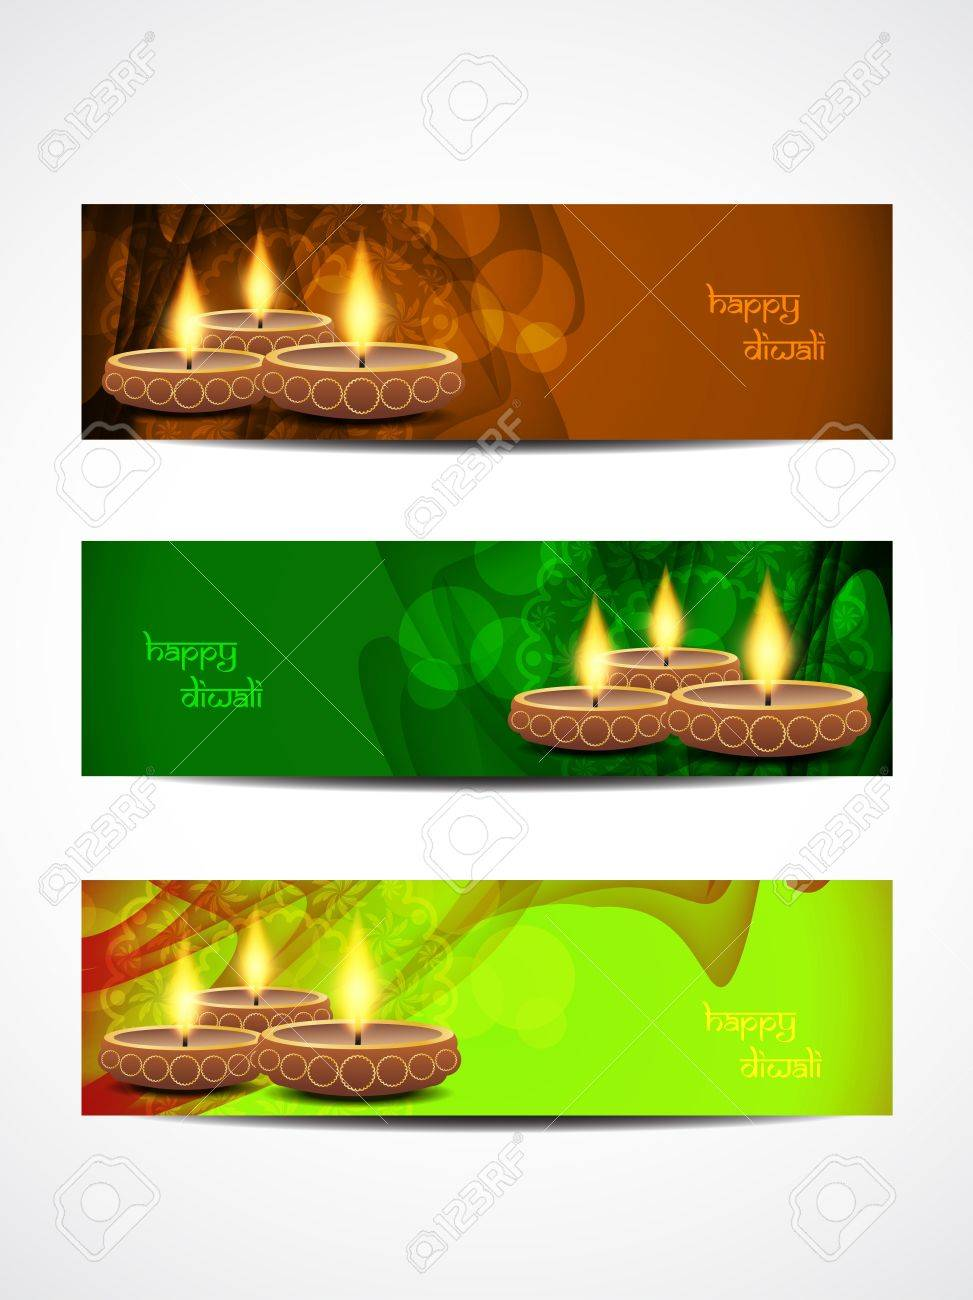 abstract vector web header banner designs for diwali Stock Vector - 21299281